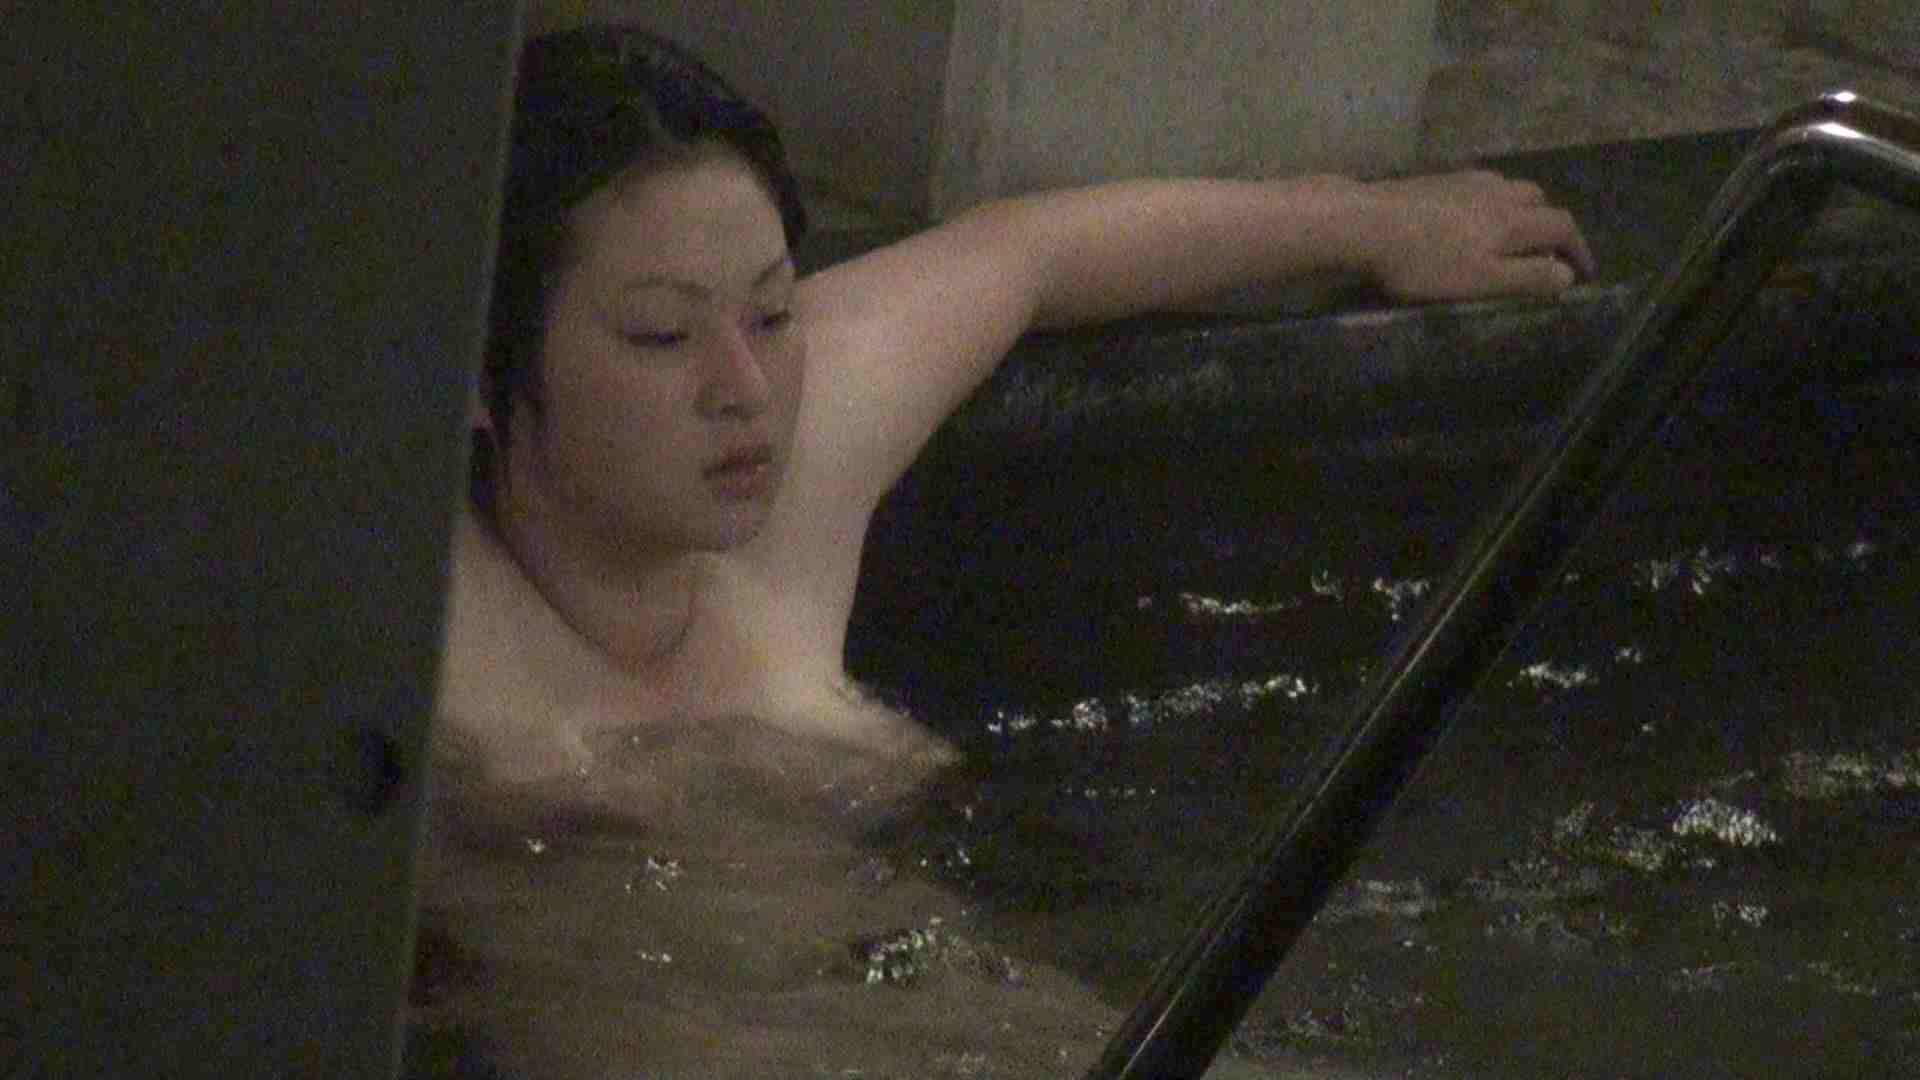 Aquaな露天風呂Vol.338 露天 AV動画キャプチャ 101pic 69